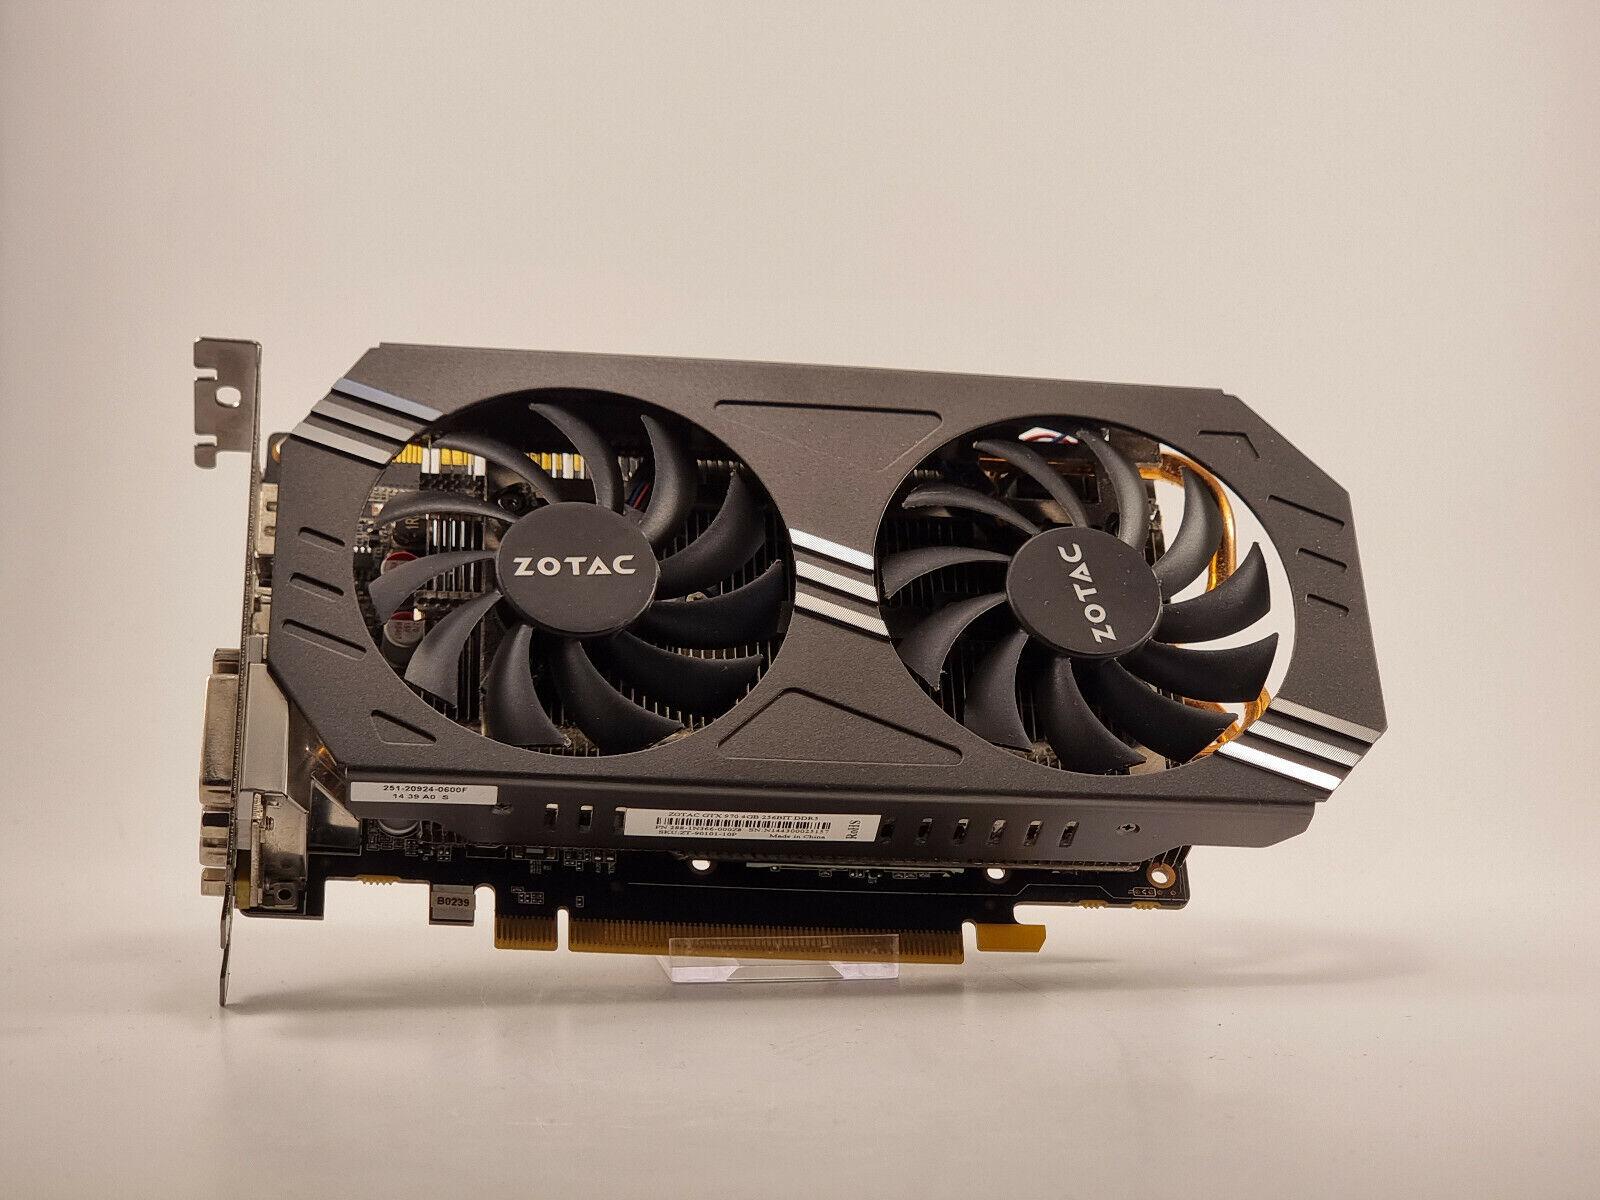 ZOTAC NVIDIA GTX 970 4GB DDR5 Graphics Card